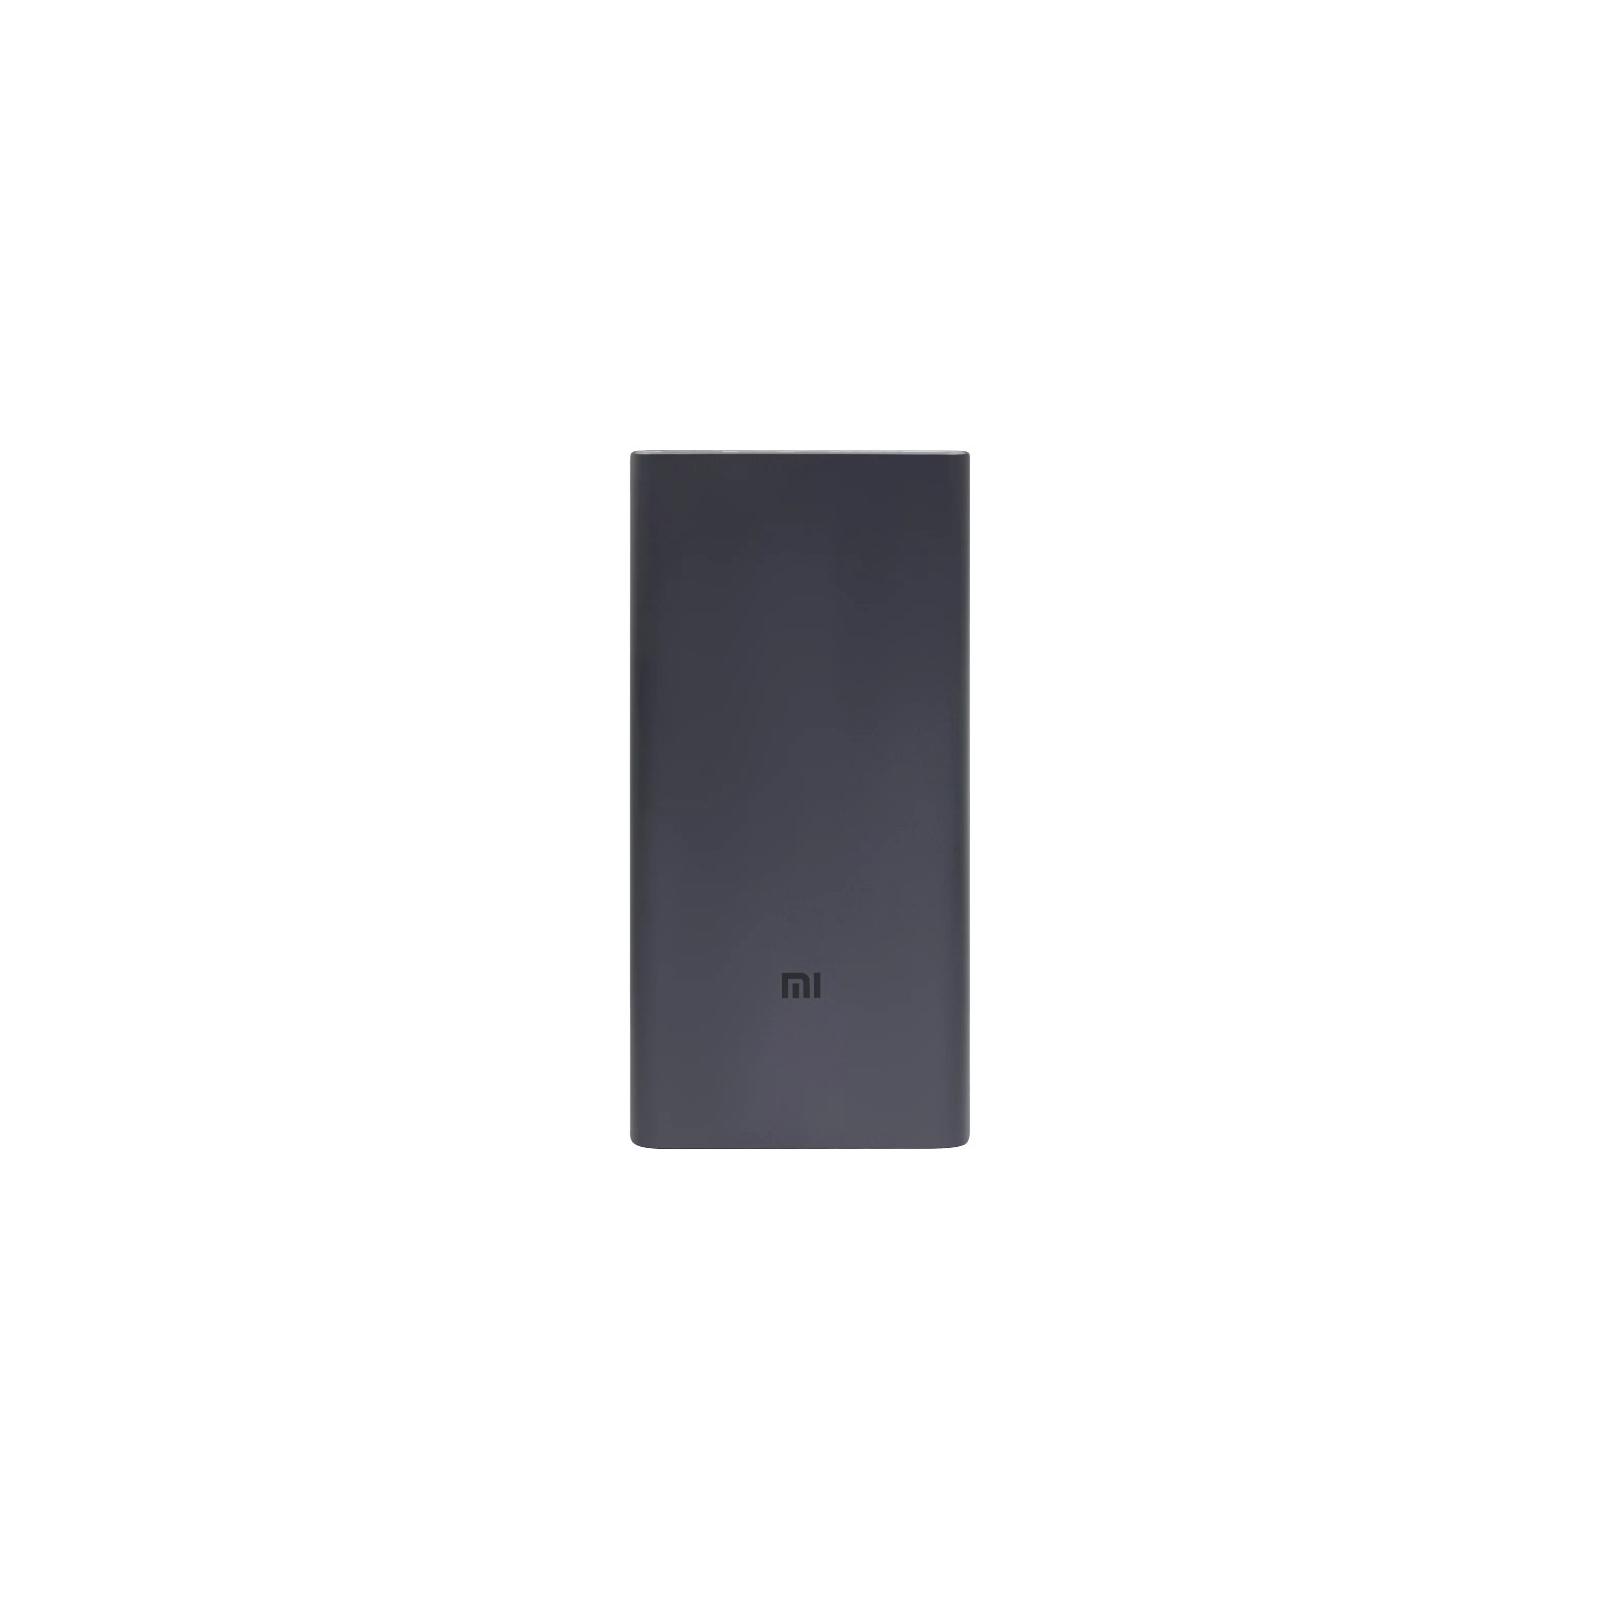 Батарея универсальная Xiaomi Mi Power bank 3 10000mAh QC3.0(Type-C), QC2.0(USB) Black (PLM12ZM-Black)